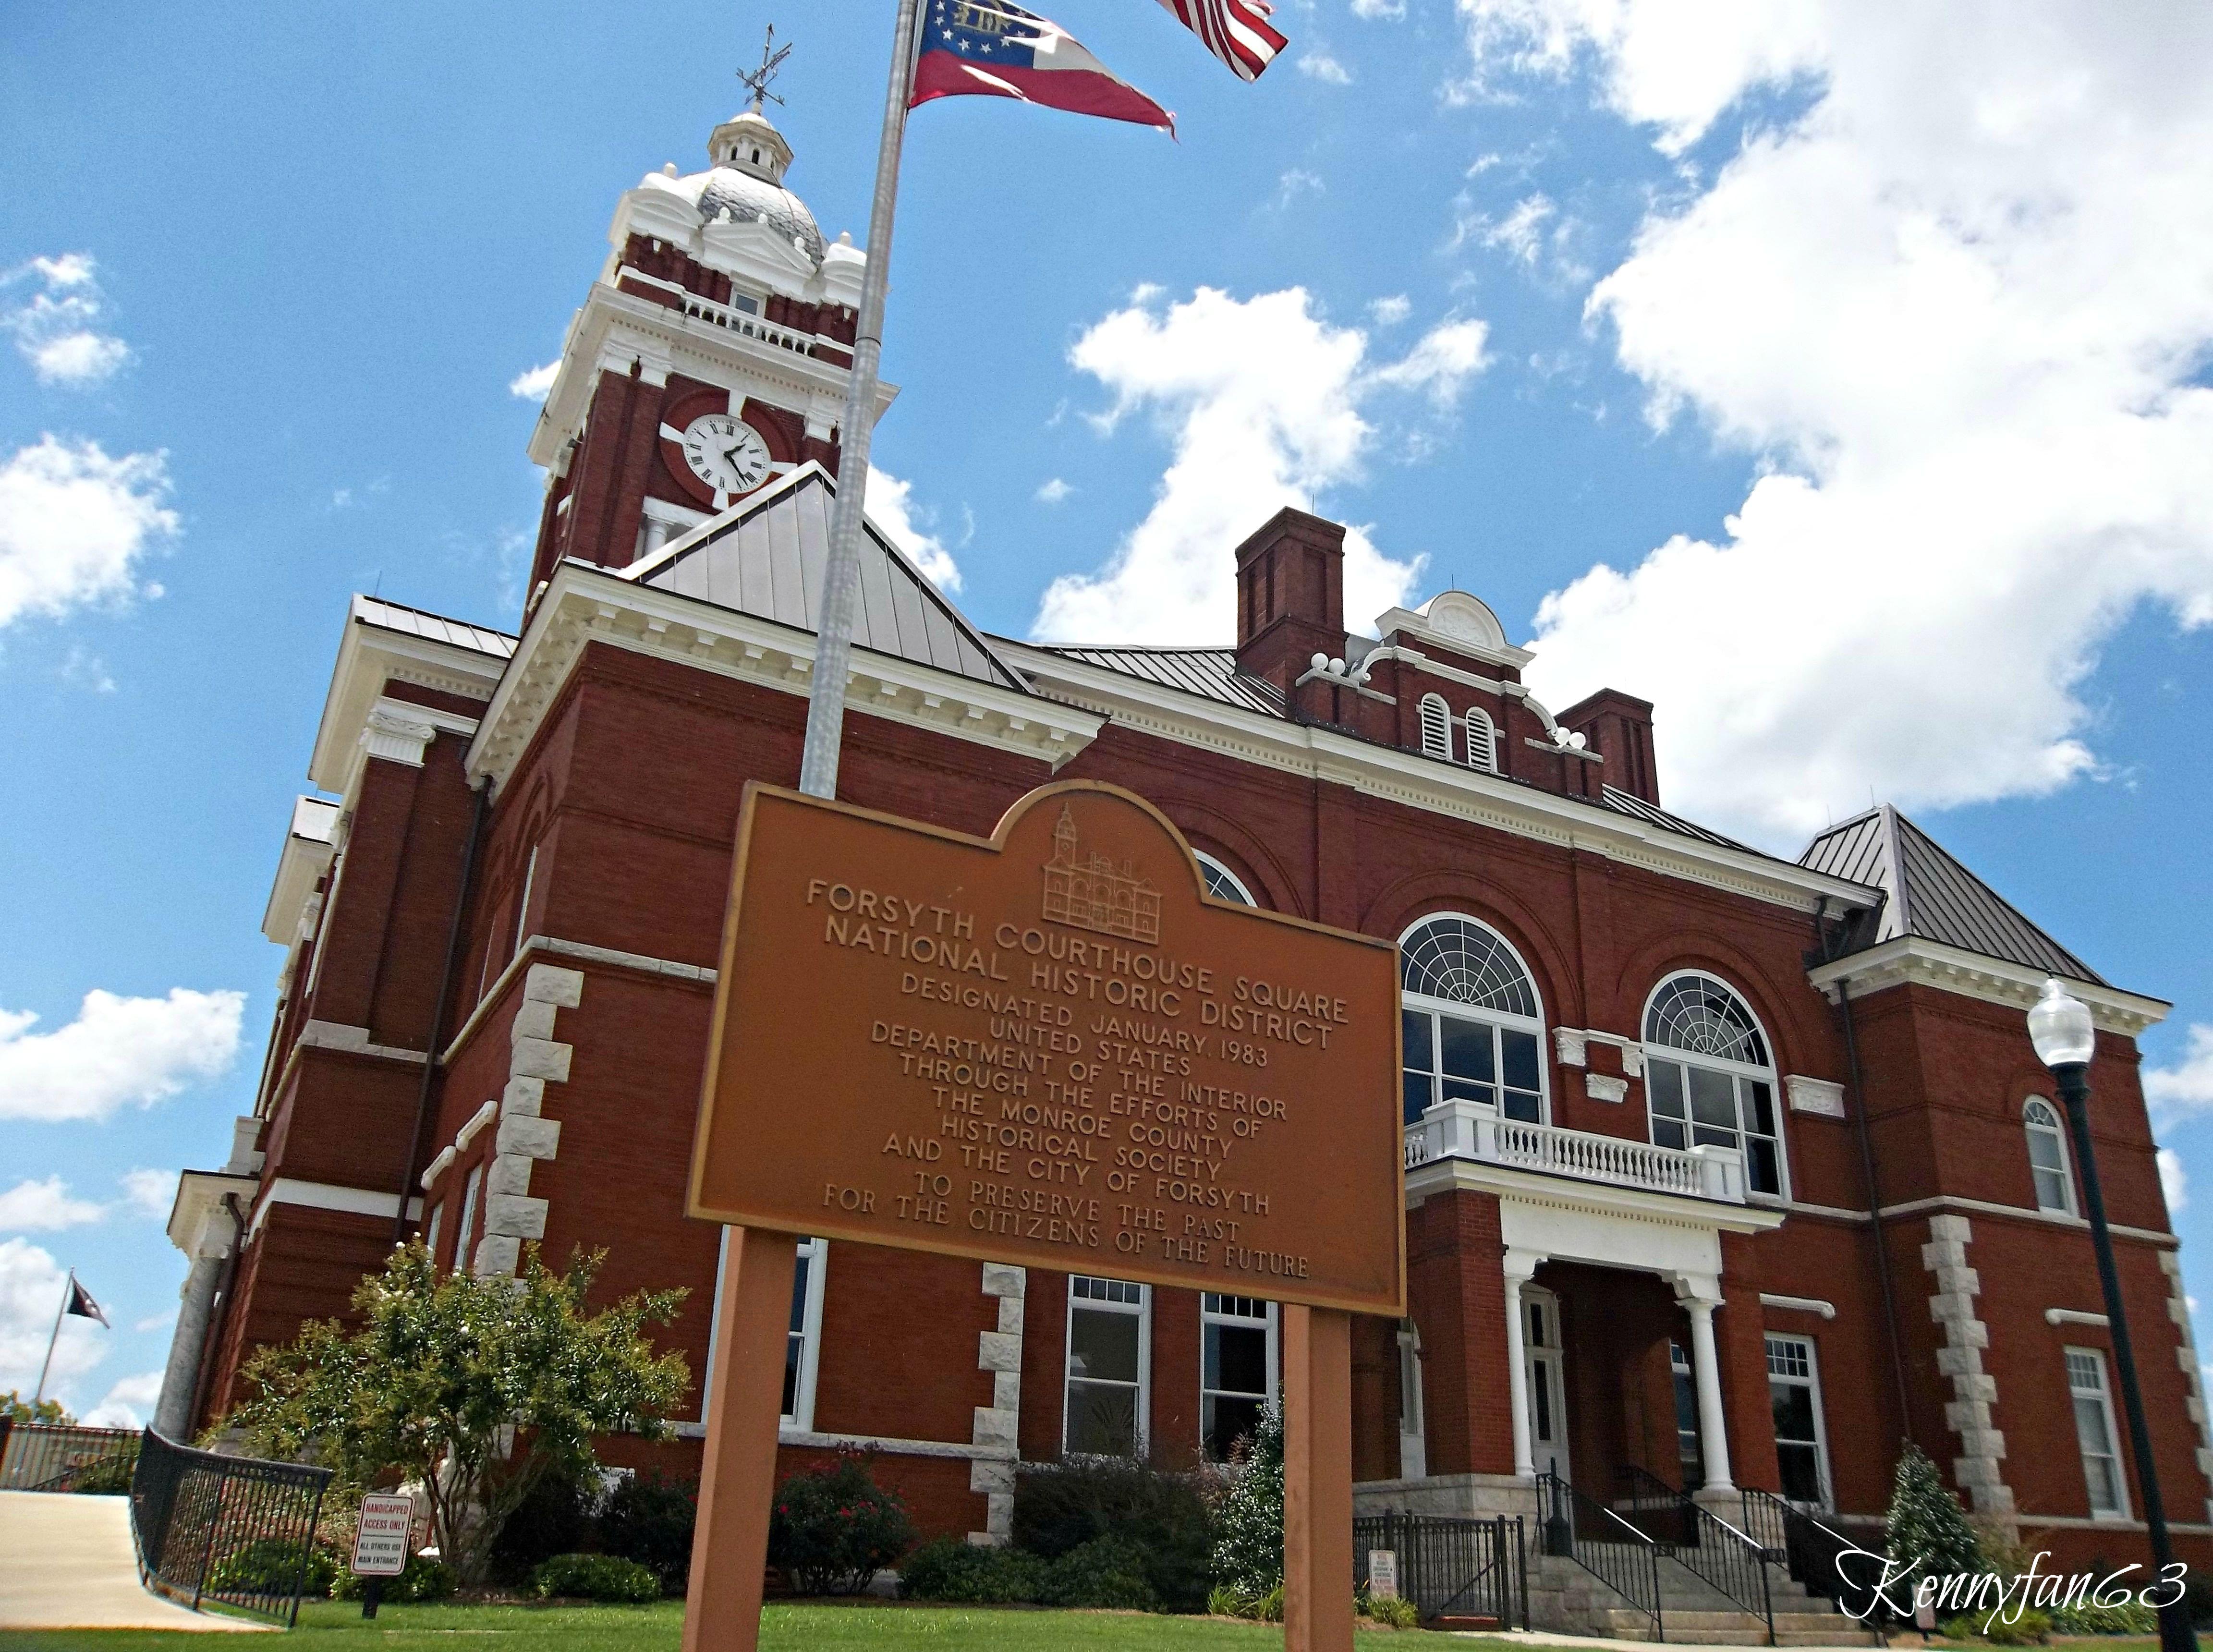 Forsyth Georgia / Monroe County Courthouse | Forsyth Georgia